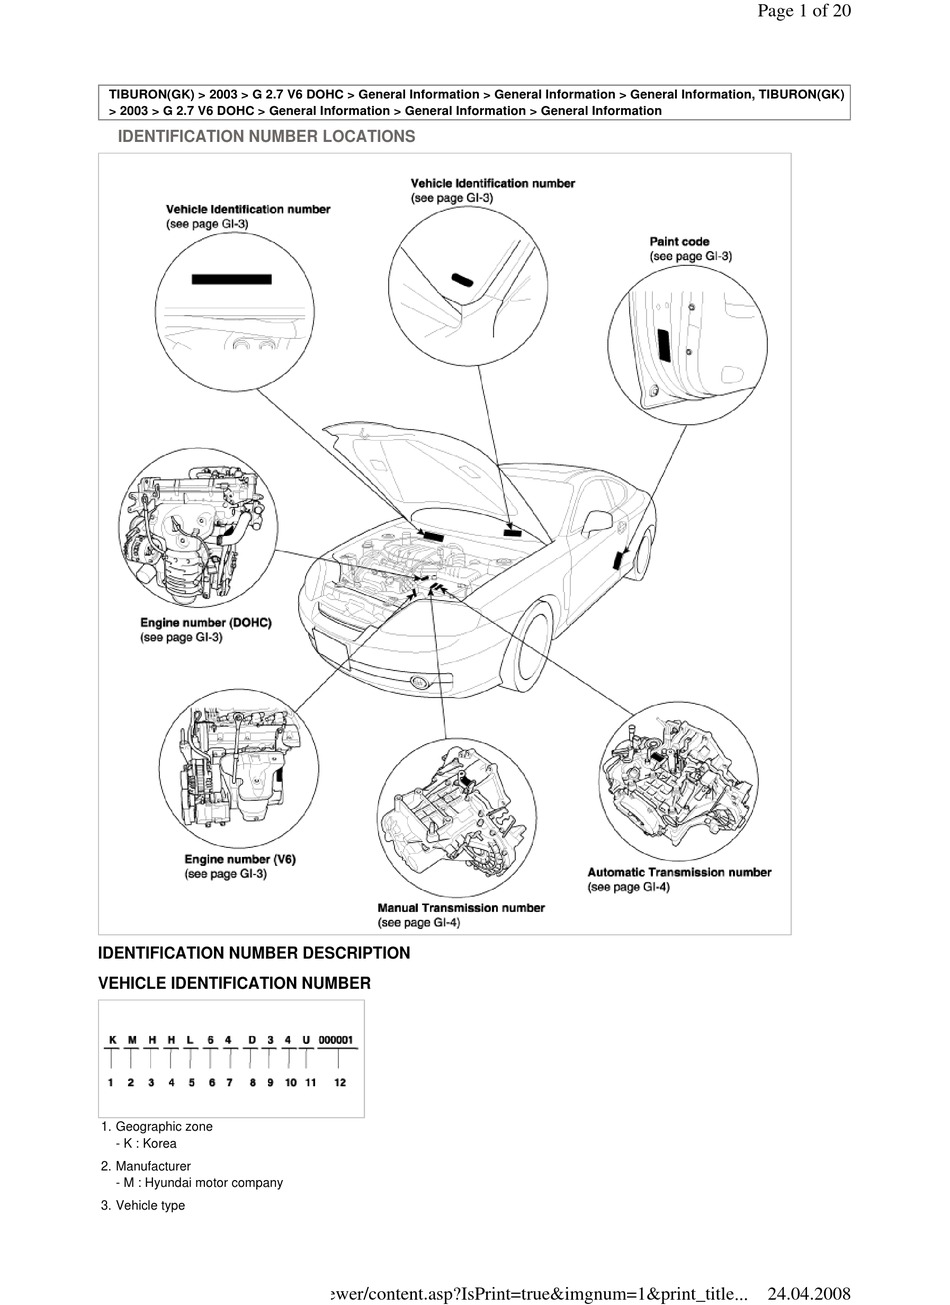 HYUNDAI TIBURON 2003 WORKSHOP MANUAL Pdf Download | ManualsLib | Hyundai 2 7 Engine Diagram |  | ManualsLib